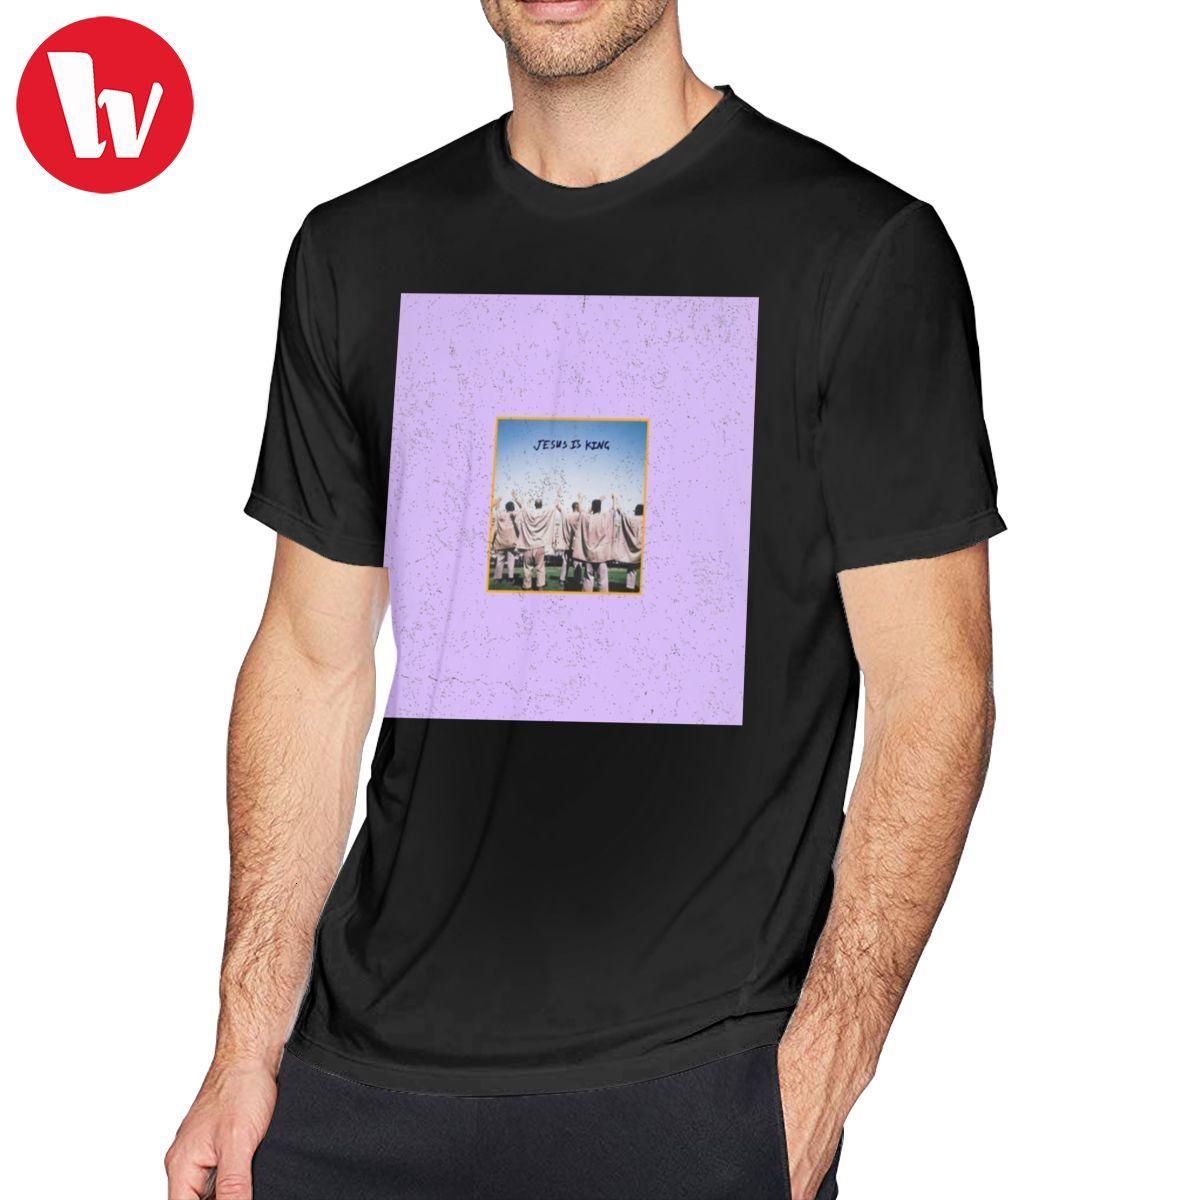 Kanye West Jesus is King Short-Sleeve T Shirt